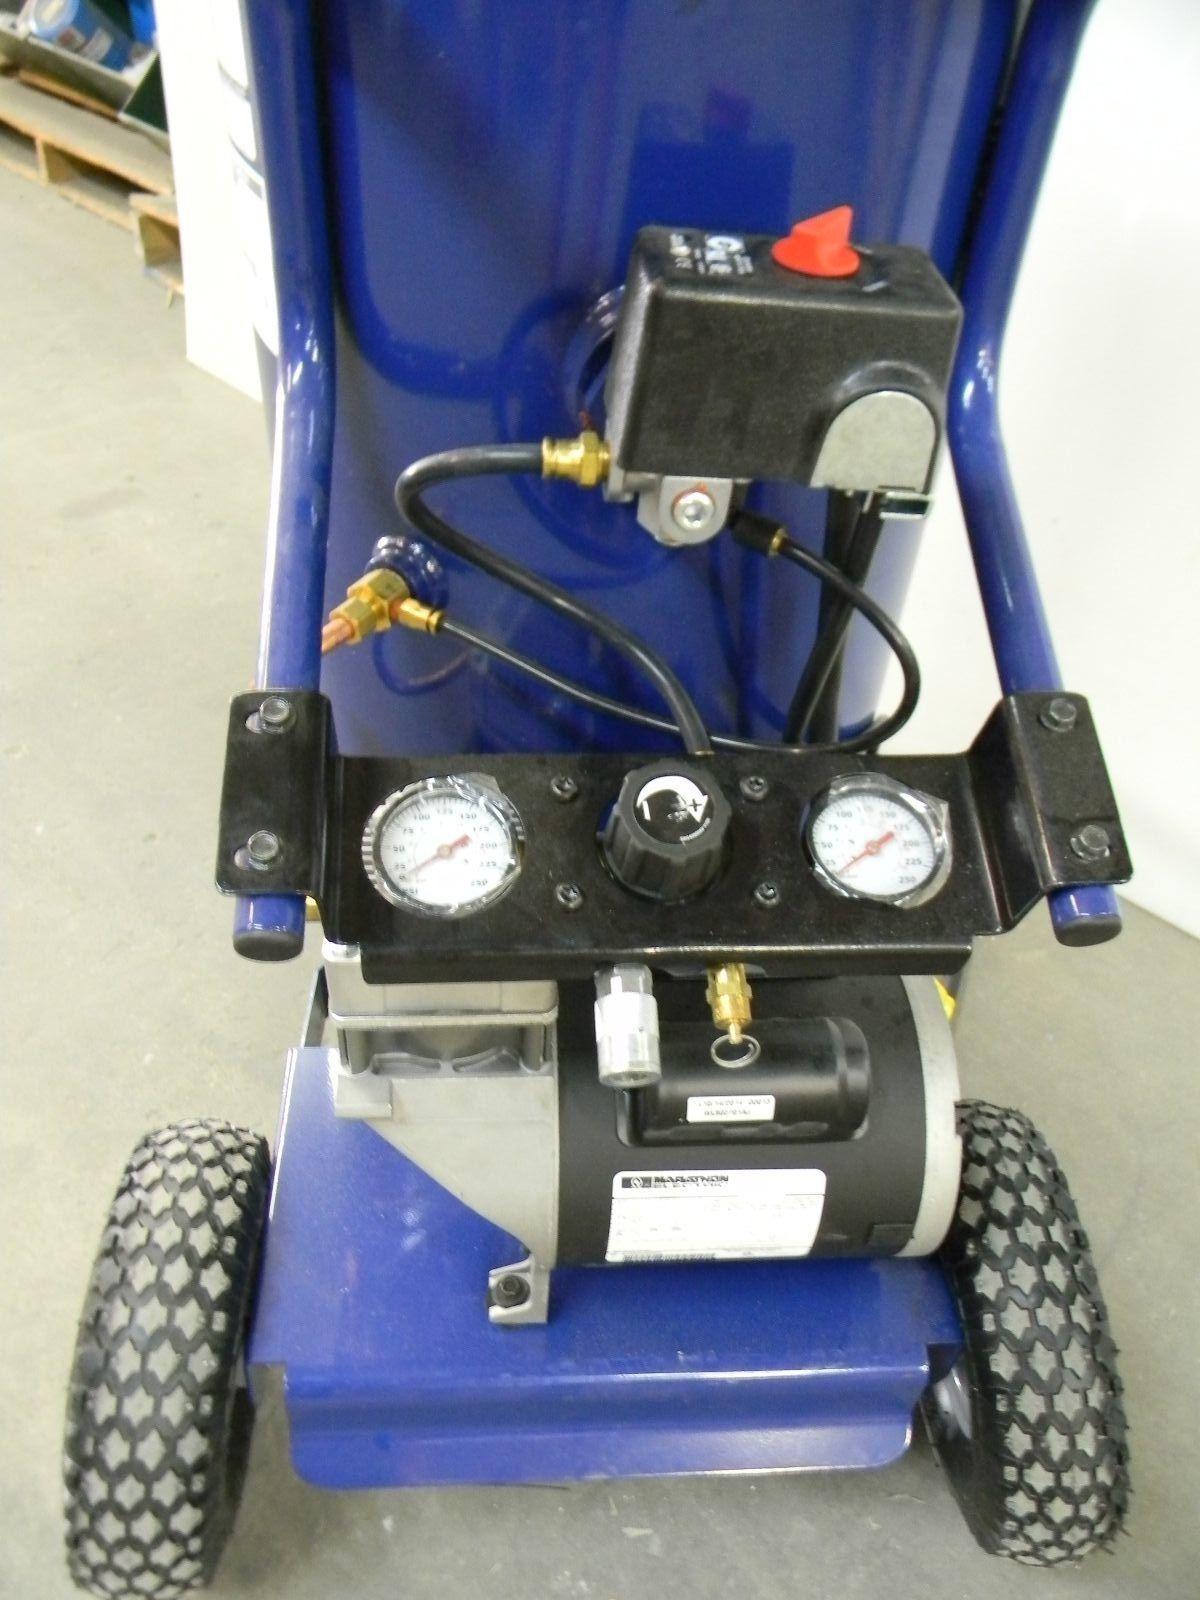 Vintage Campbell Hausfeld Air Compressor : Campbell hausfeld wl gal portable v electric air